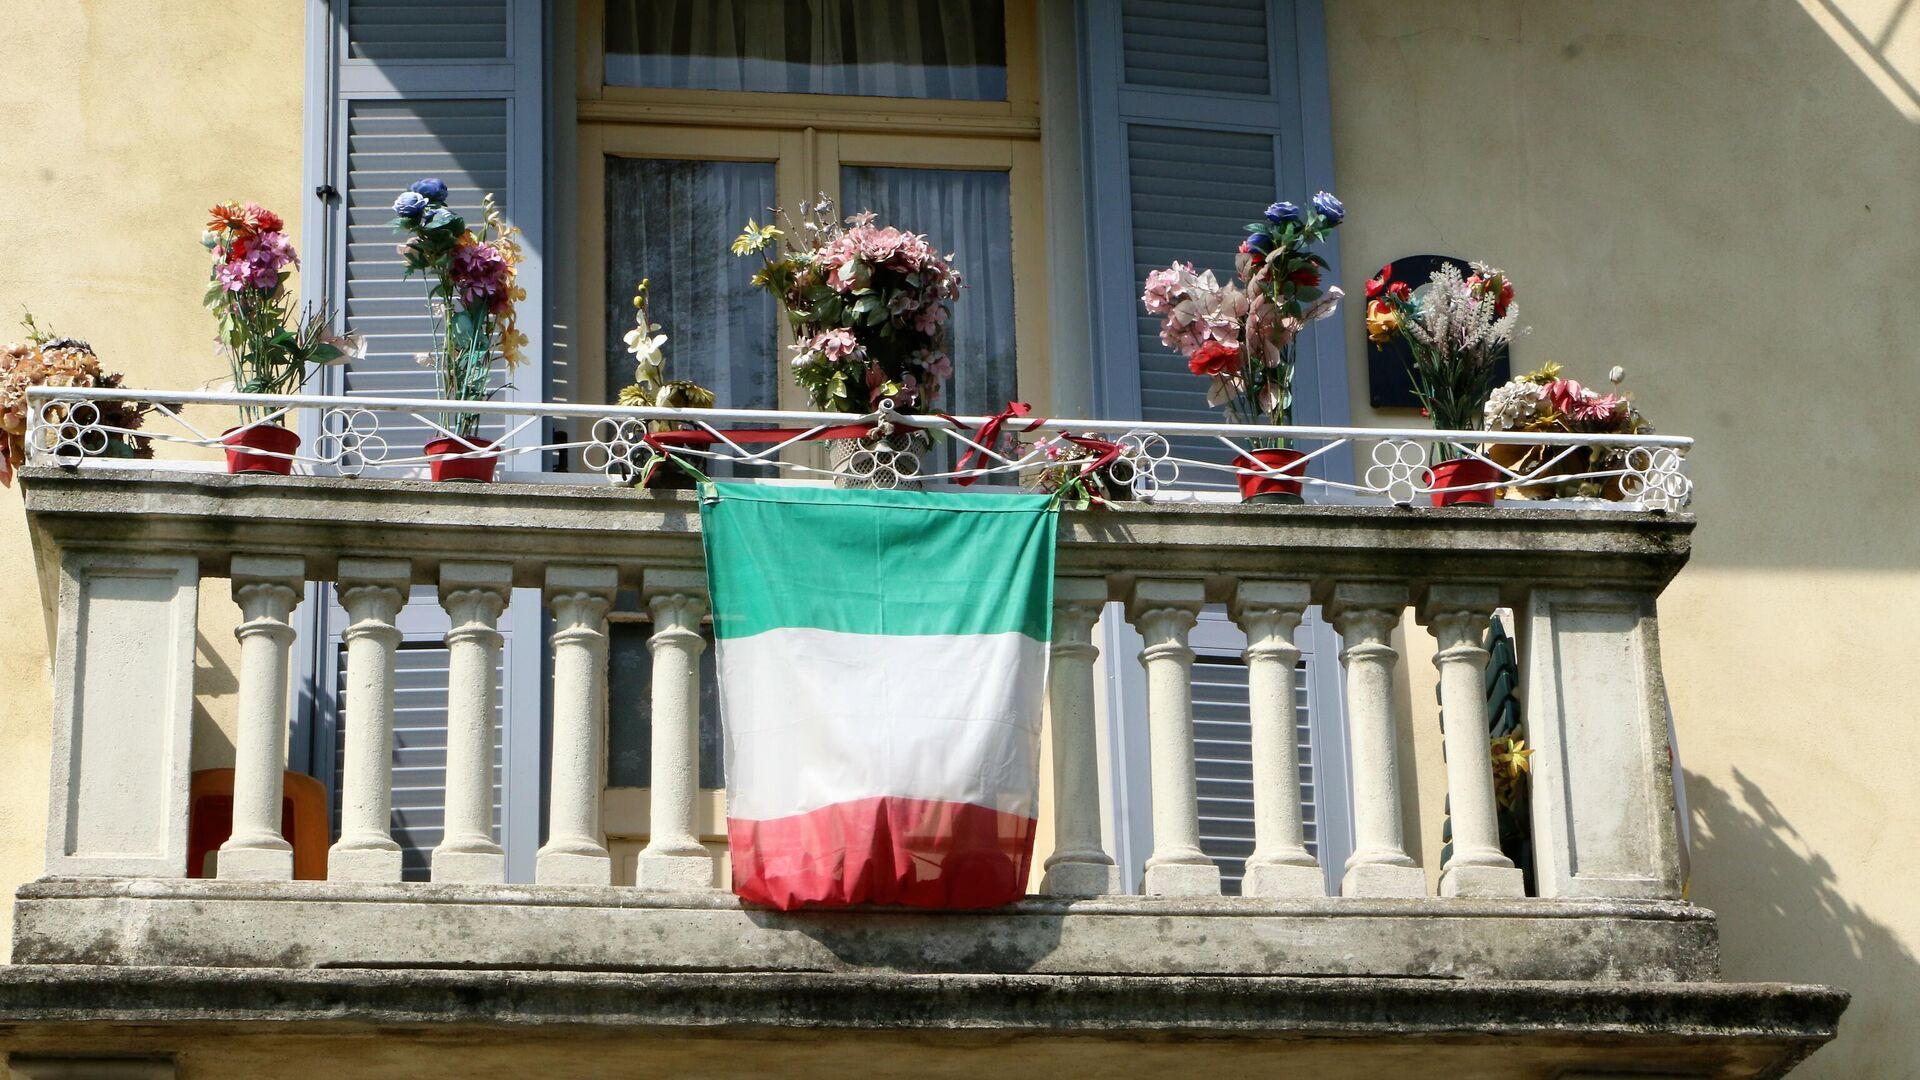 Bandiera italiana - Sputnik Italia, 1920, 09.07.2021